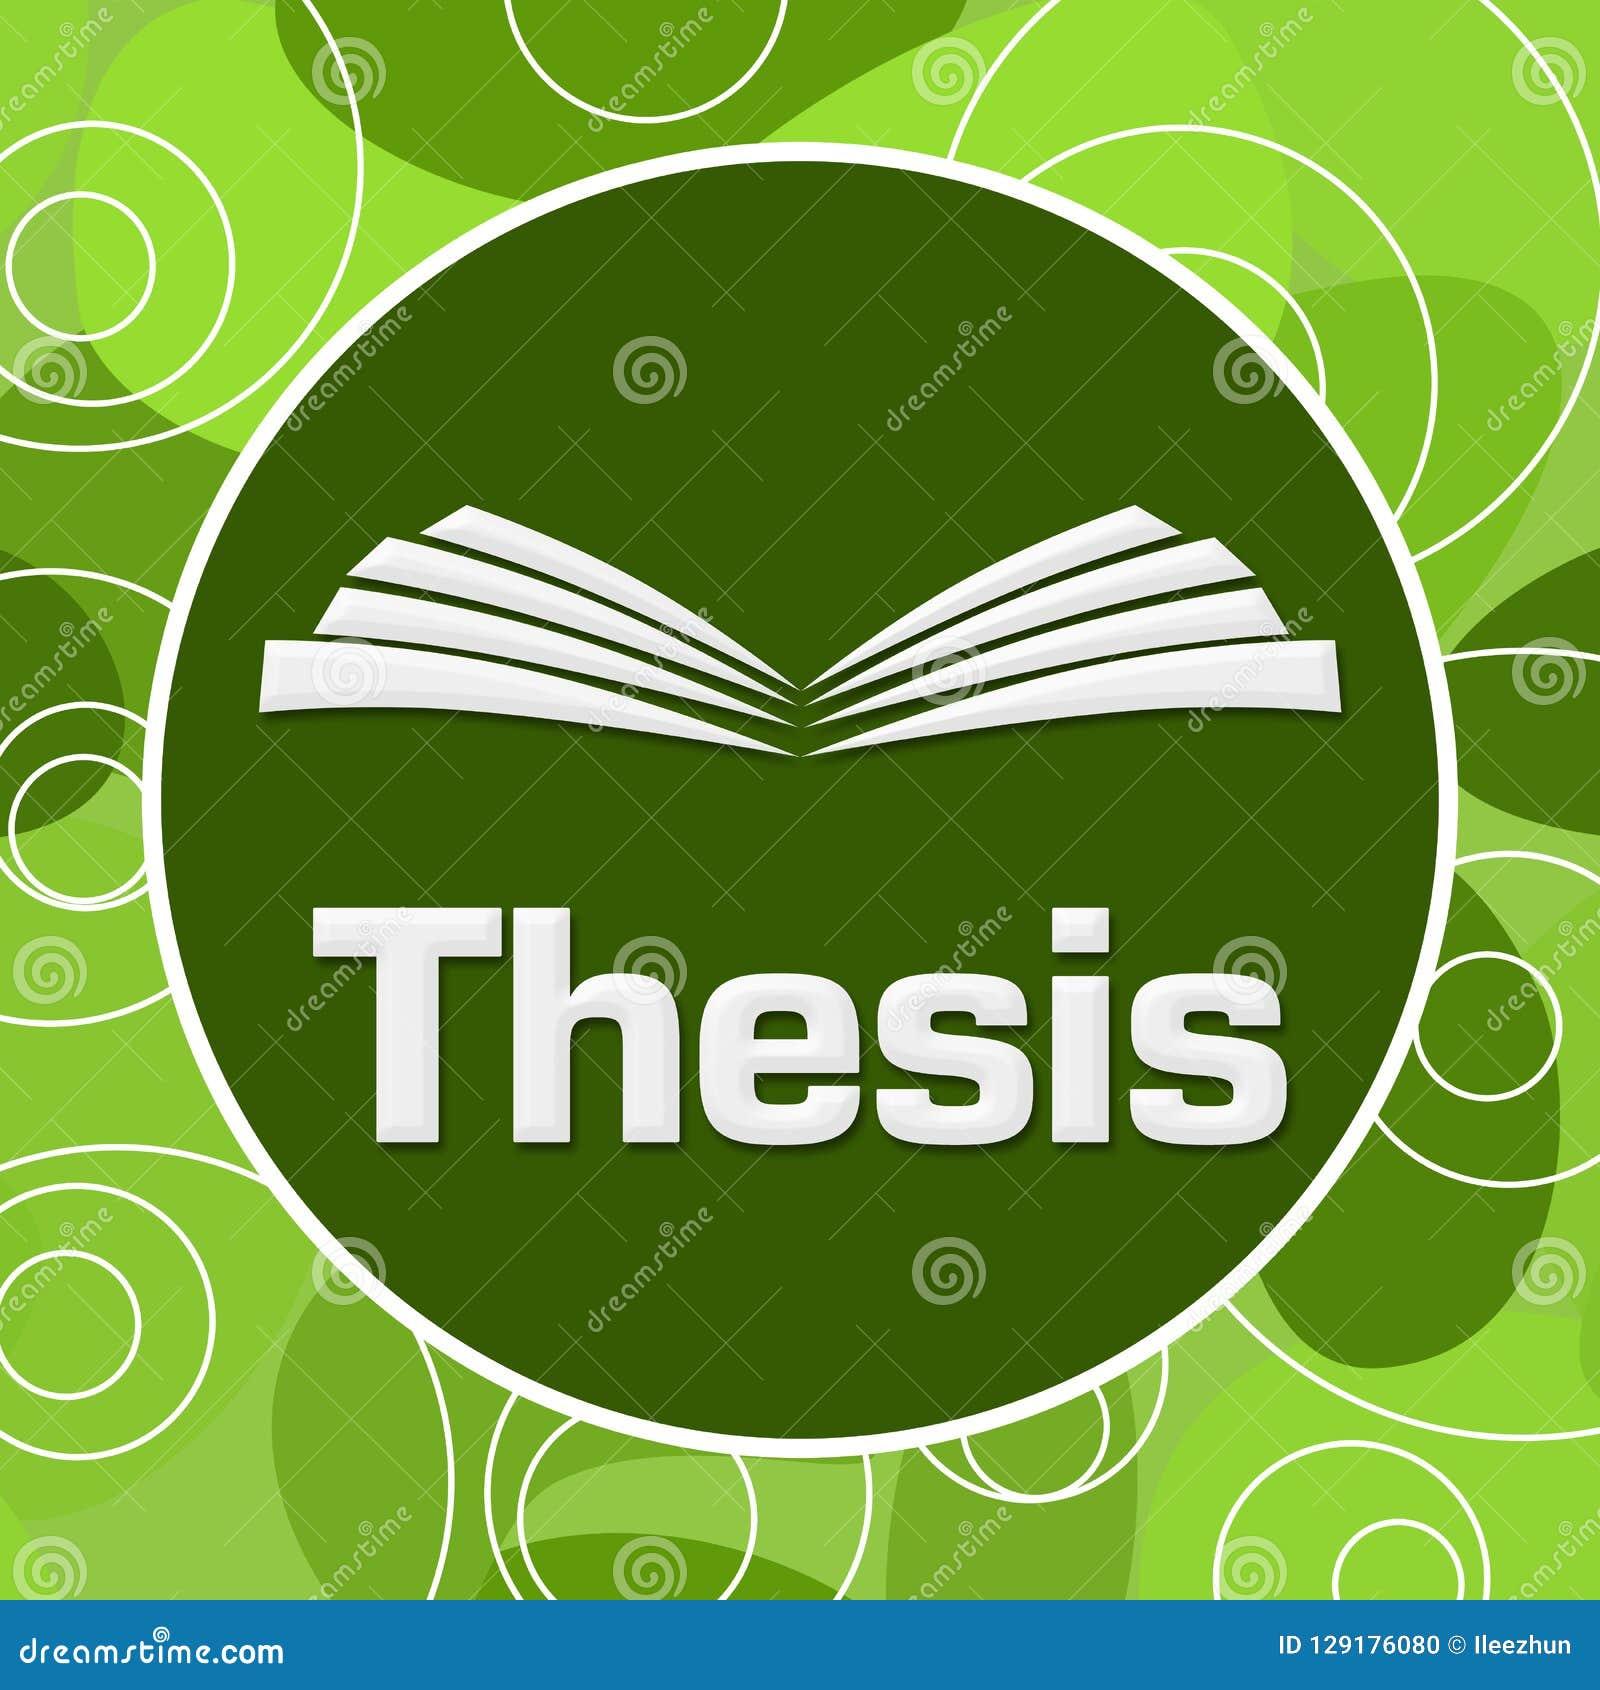 Thesis Green Random Rings Circle Stock Illustration - Illustration Of Blue,  Study: 129176080